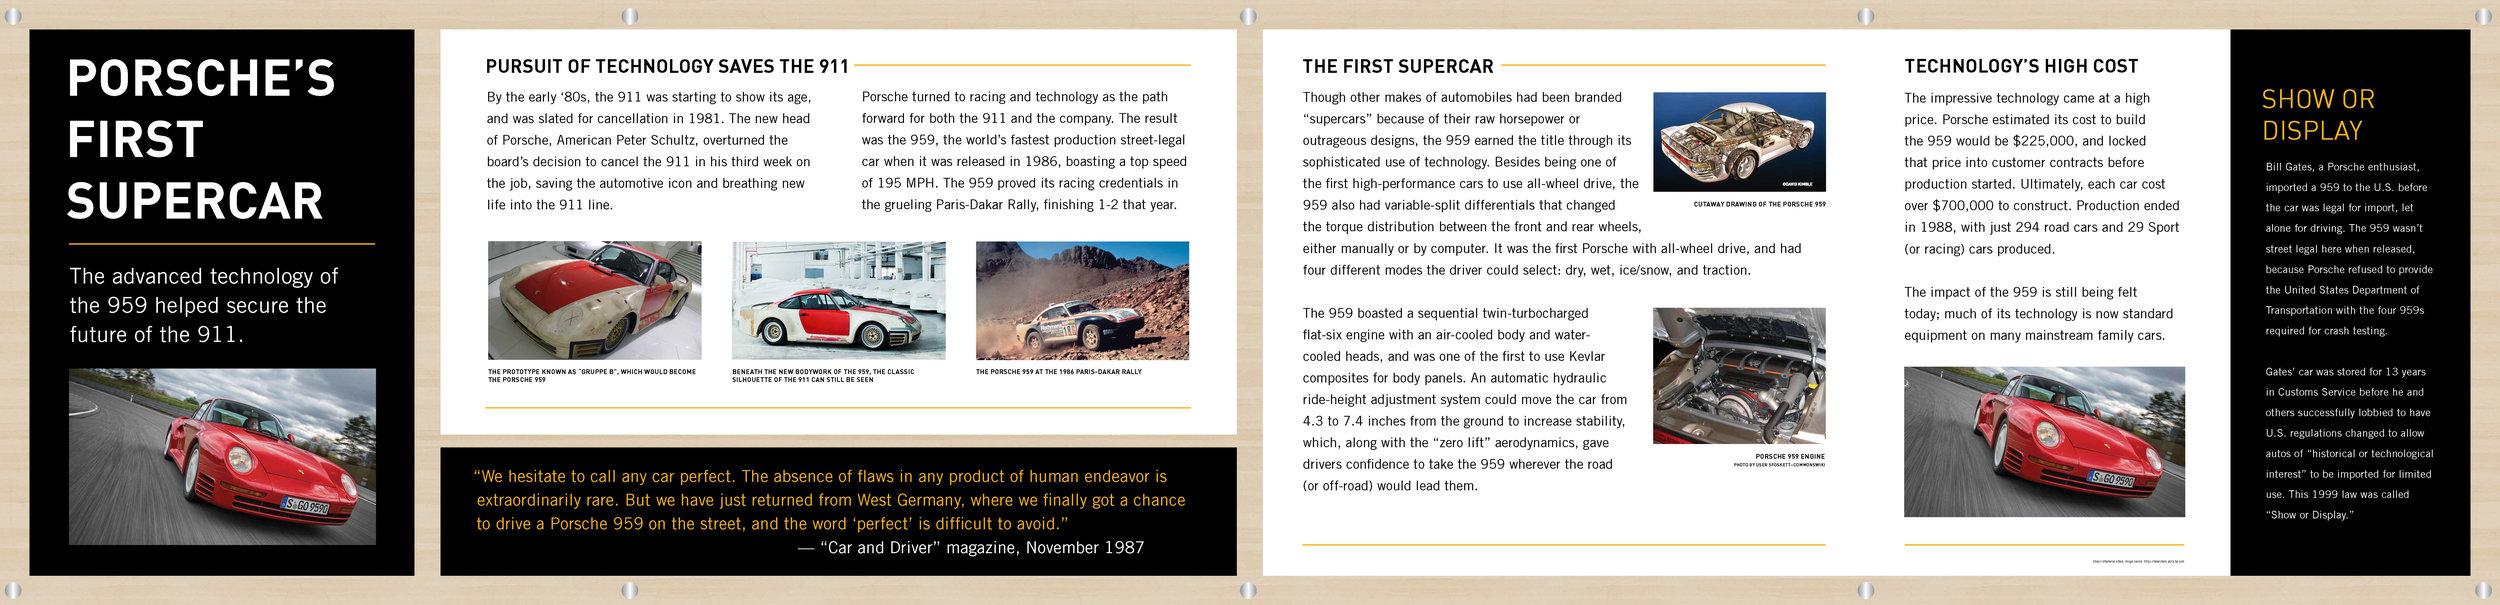 Porsche_Interpretive Panels_v11_Page_4.jpg